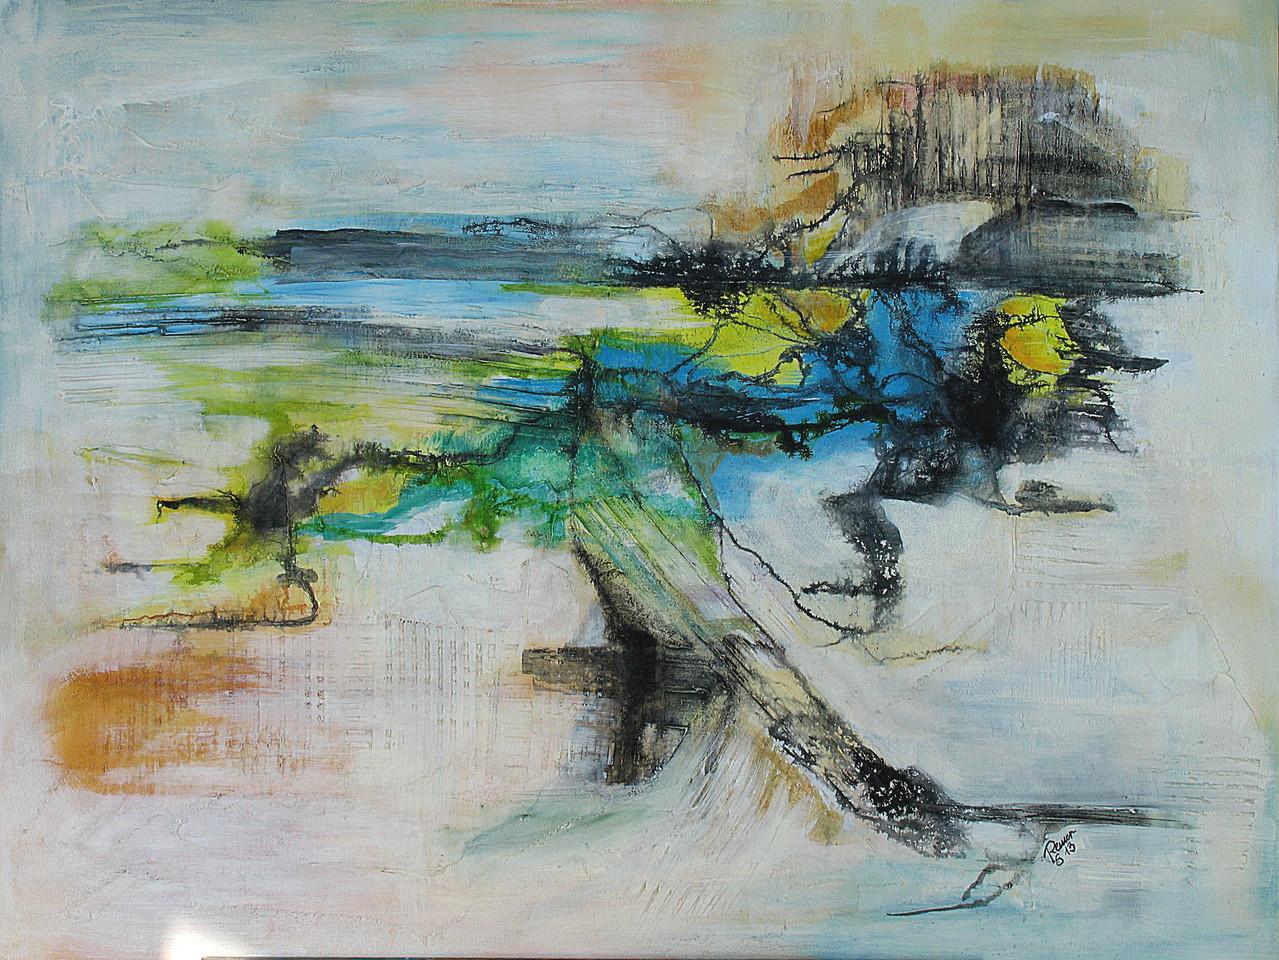 Flusslandschaft,  Acryl, Gips, Tusche auf Holz, 60 x 80 cm